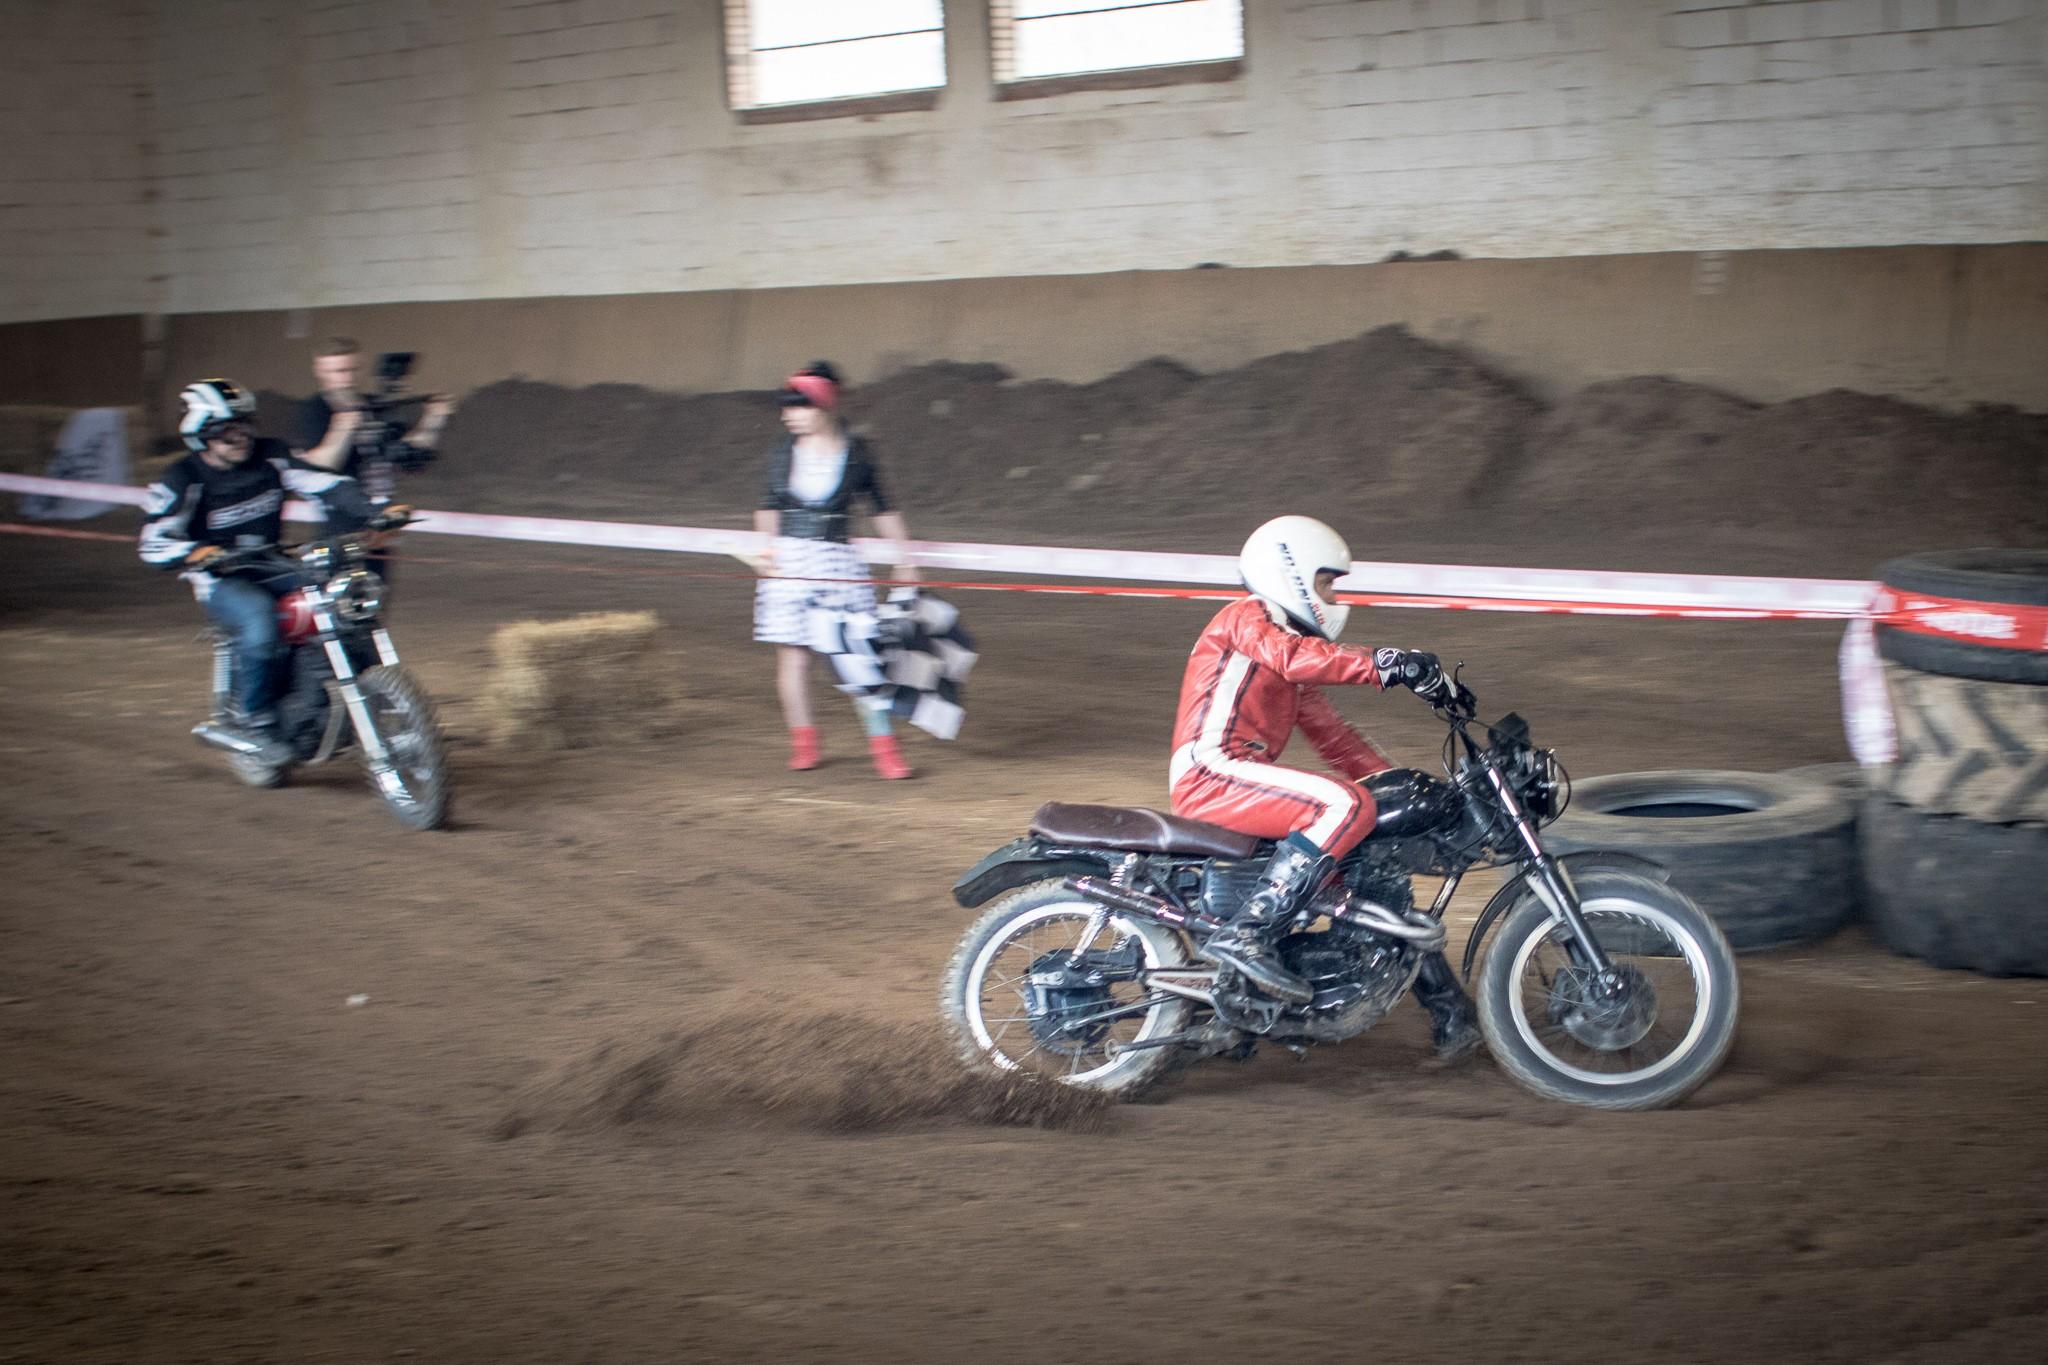 Donkey Dash racing during Custom Days in Przywidz